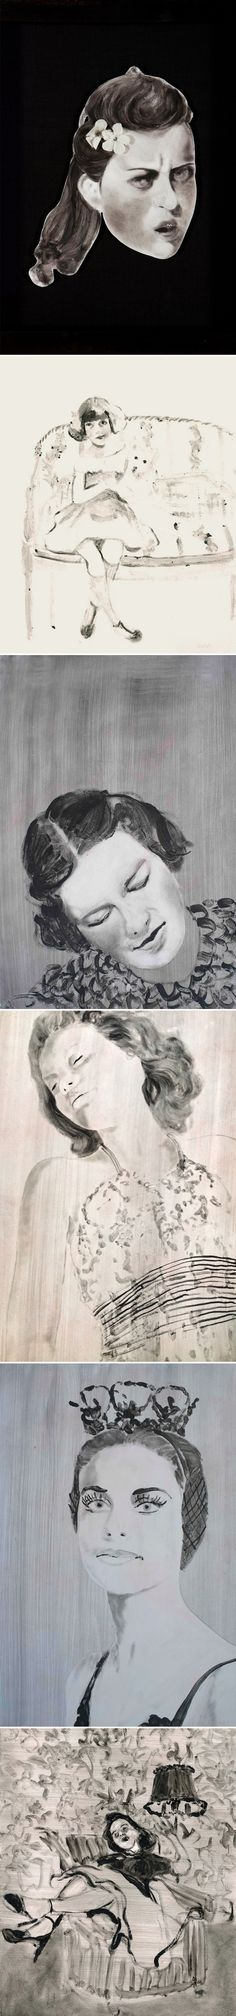 paintings by dana holst